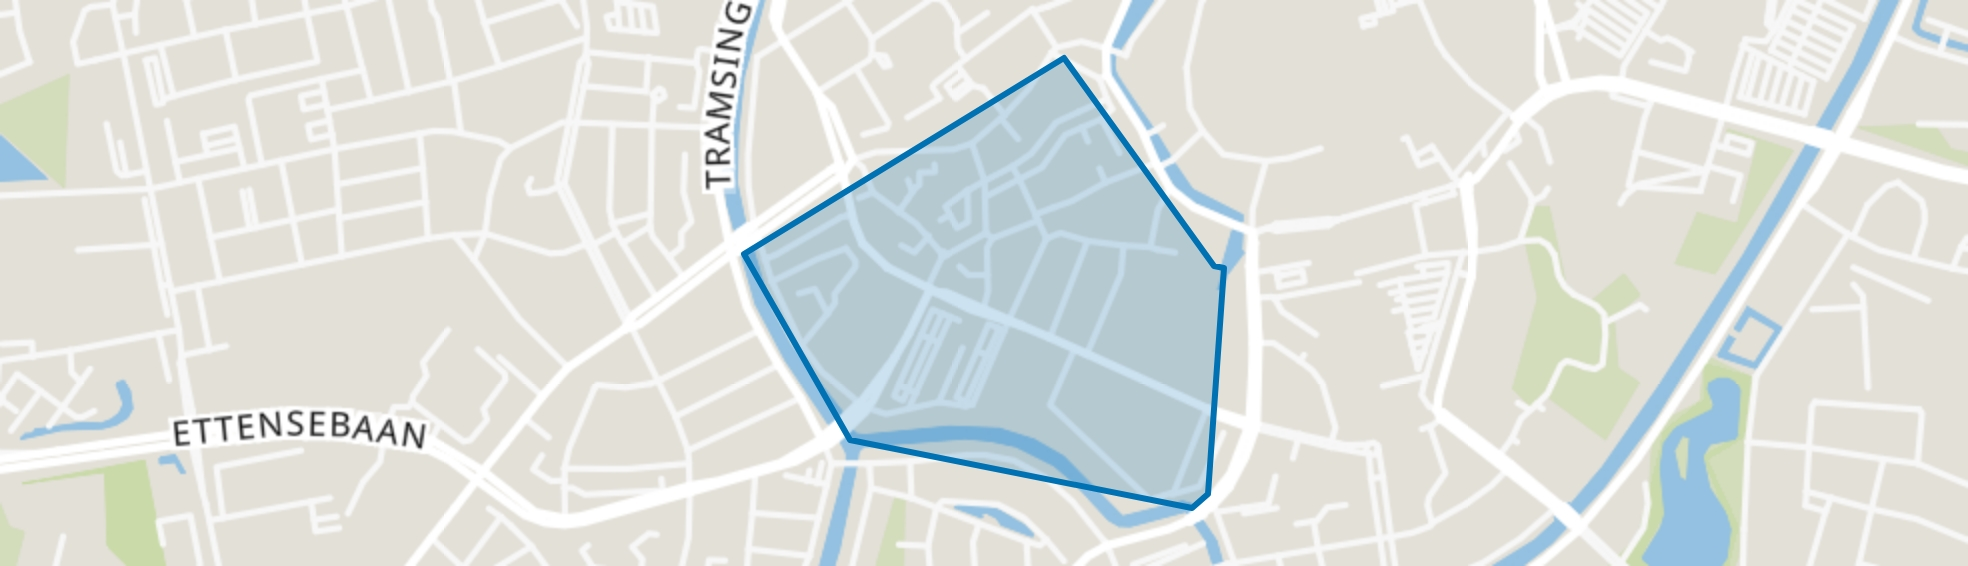 Fellenoord, Breda map